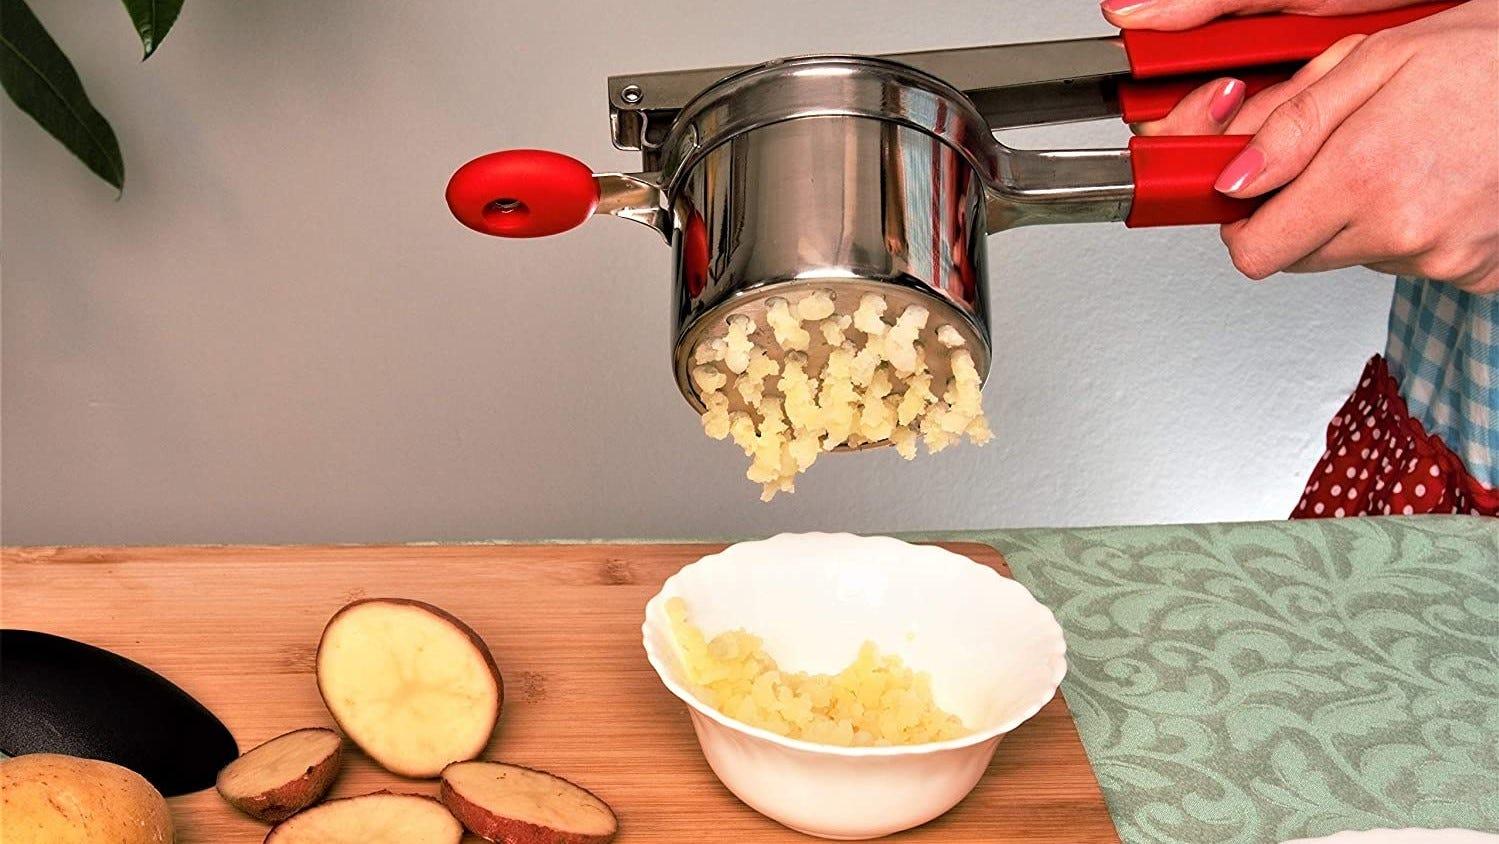 A person using a potato ricer to mash potatoes.